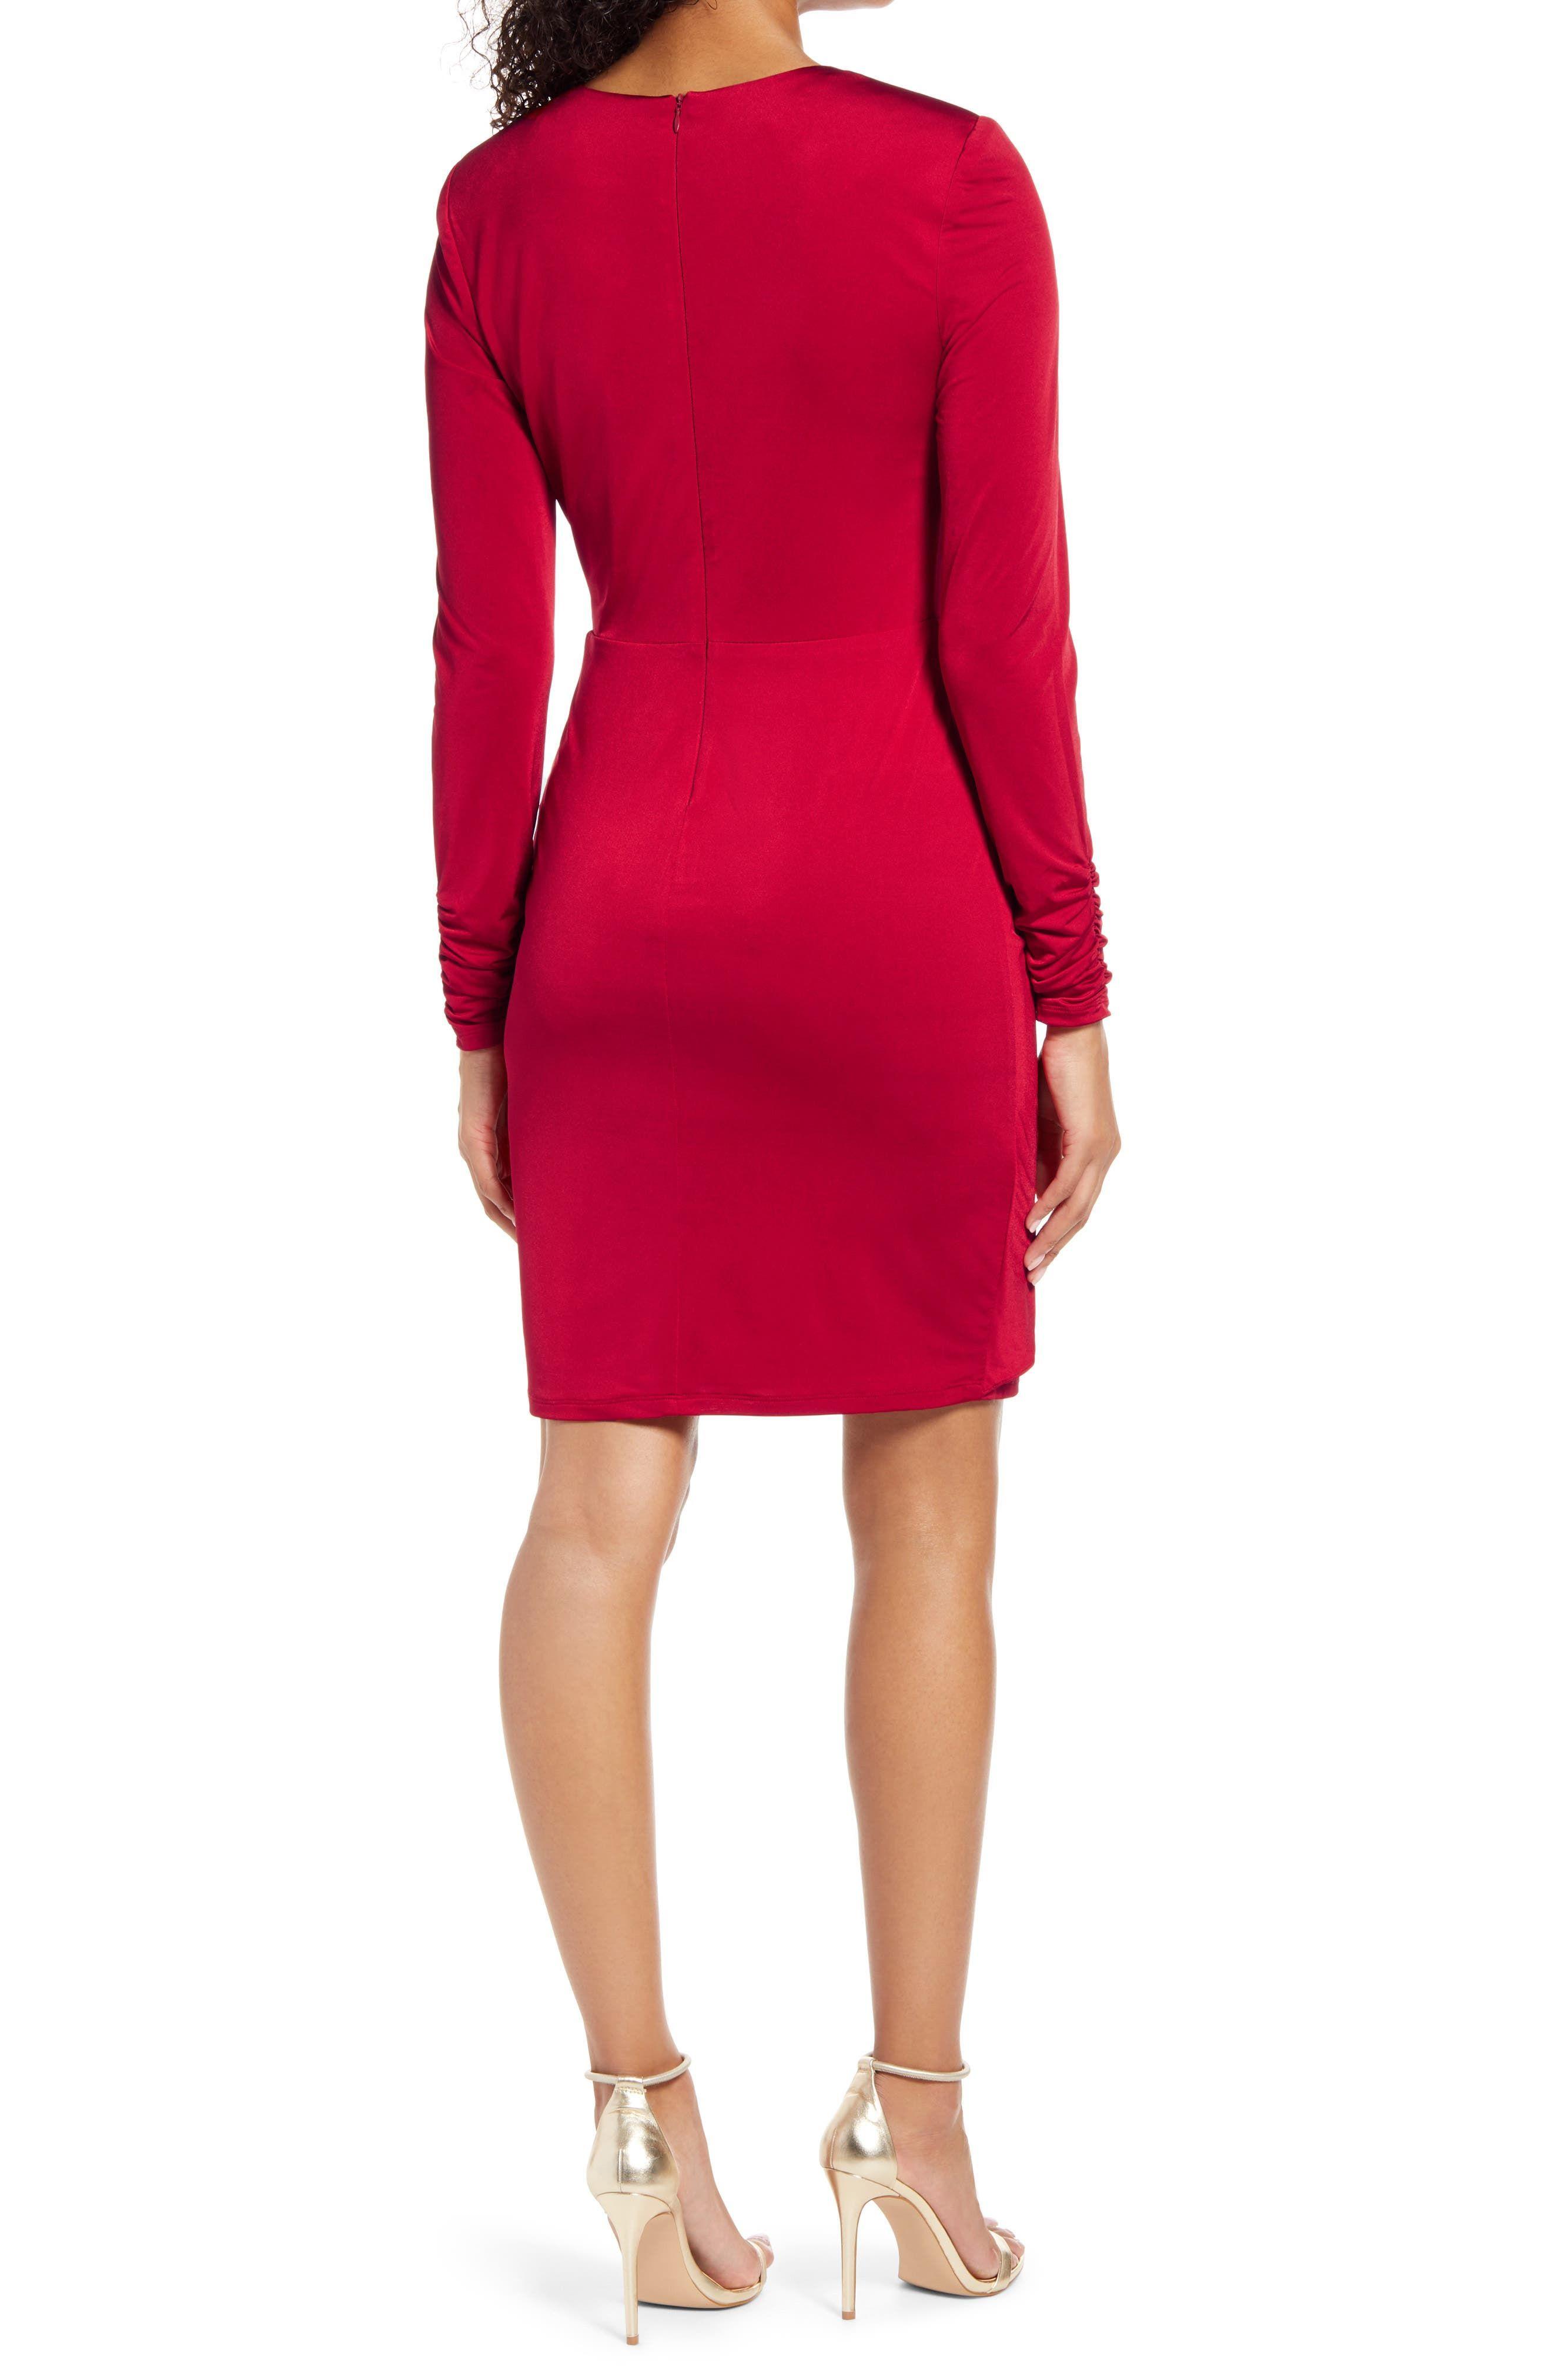 Vince Camuto Wrap Front Long Sleeve Cocktail Dress Nordstrom In 2021 Slinky Dress Long Sleeve Cocktail Dress Dresses [ 4048 x 2640 Pixel ]